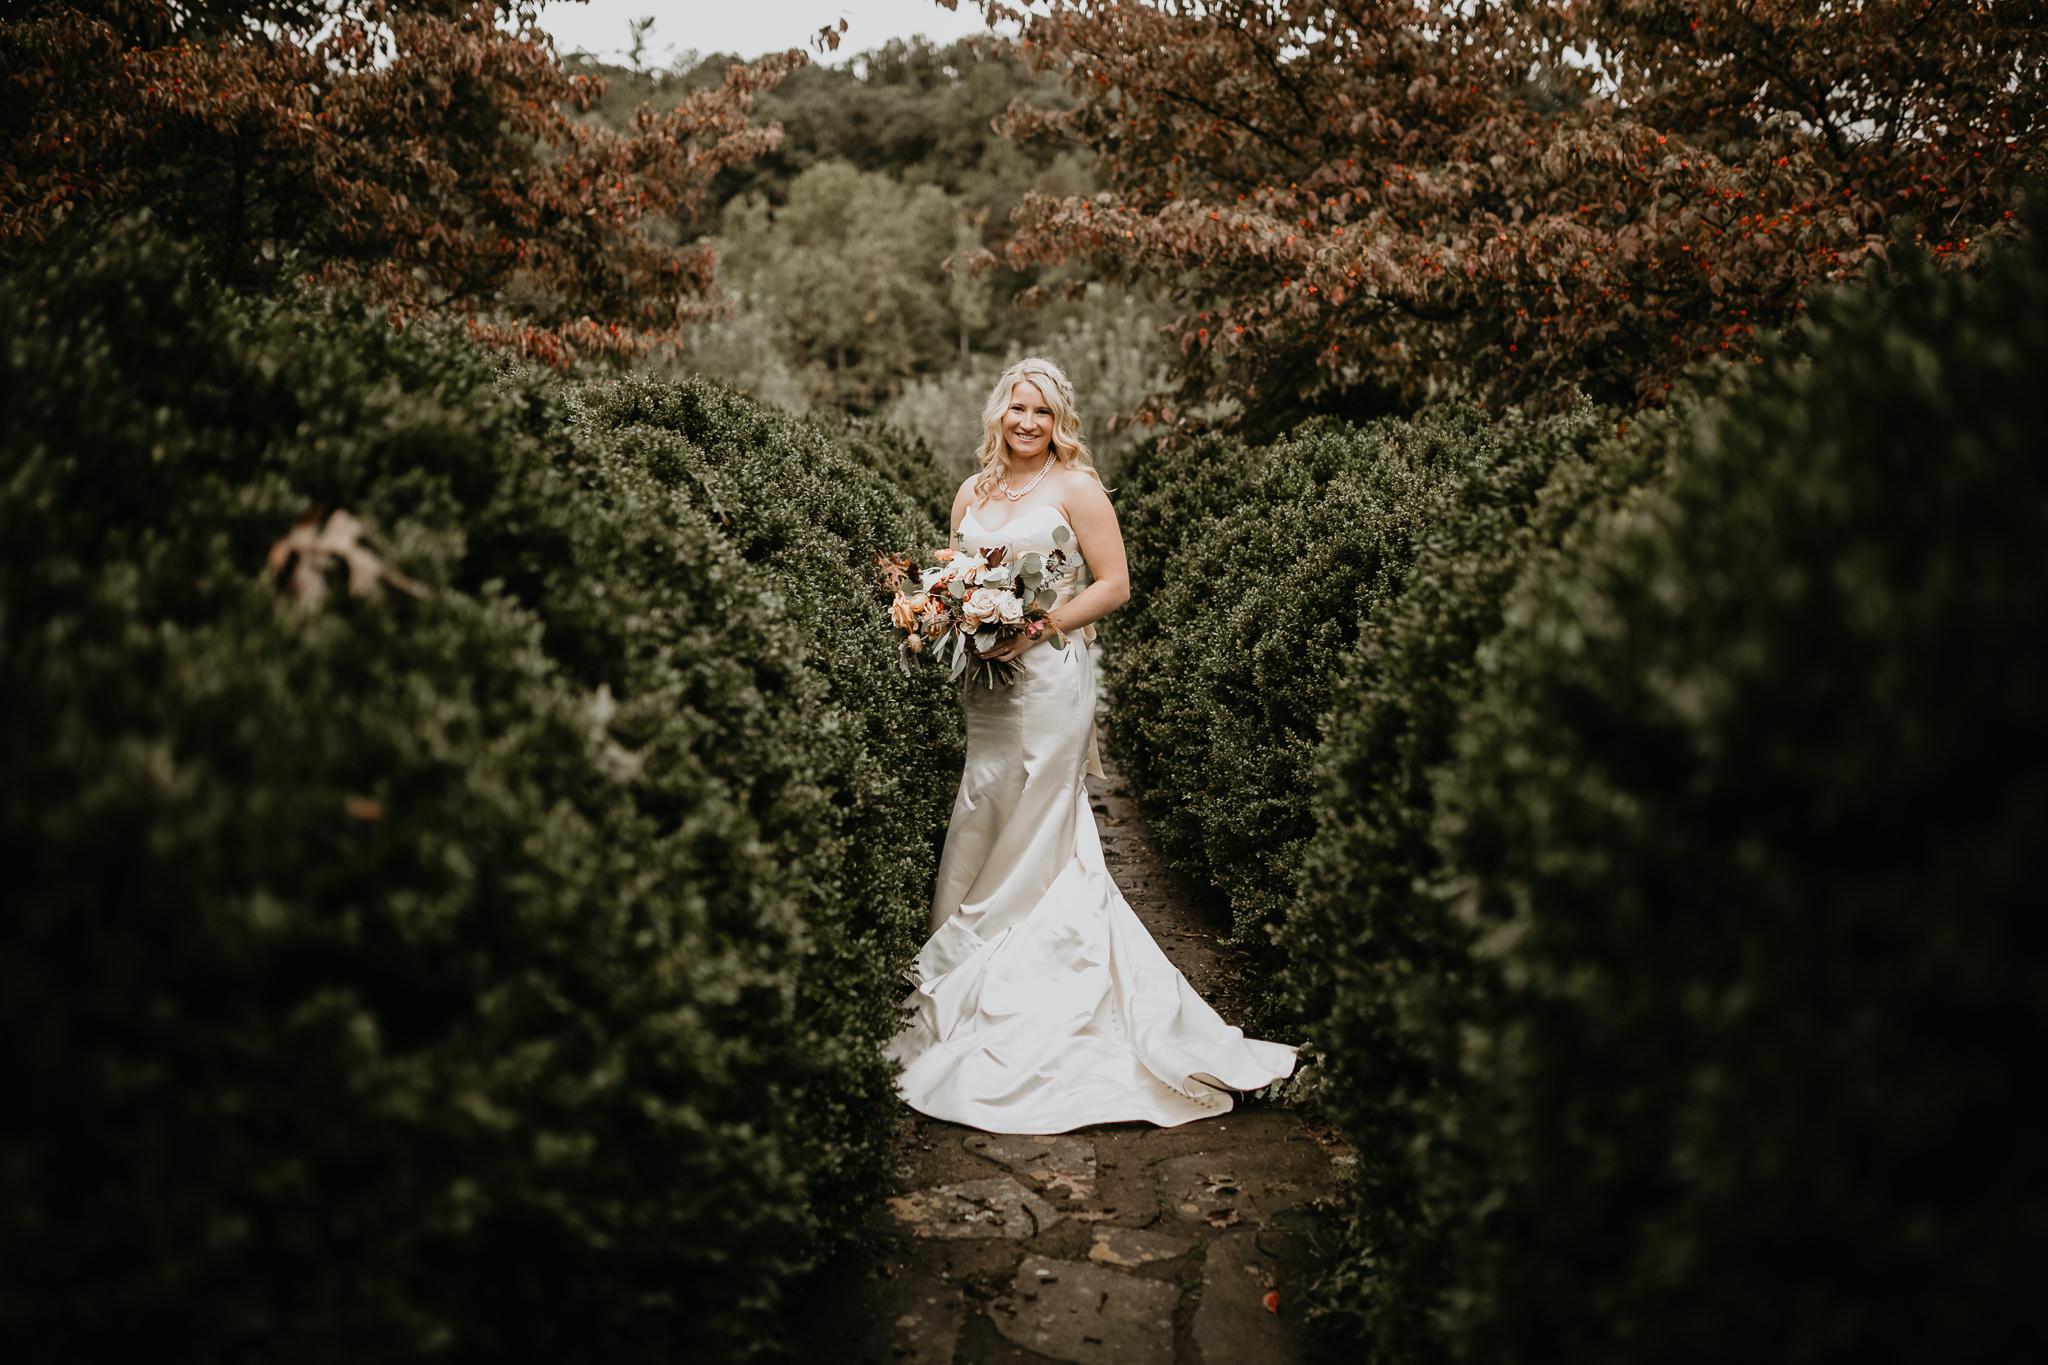 Sundara - Weddings - Virginia - Best Wedding Photographer - Pat Cori Photography-33.jpg